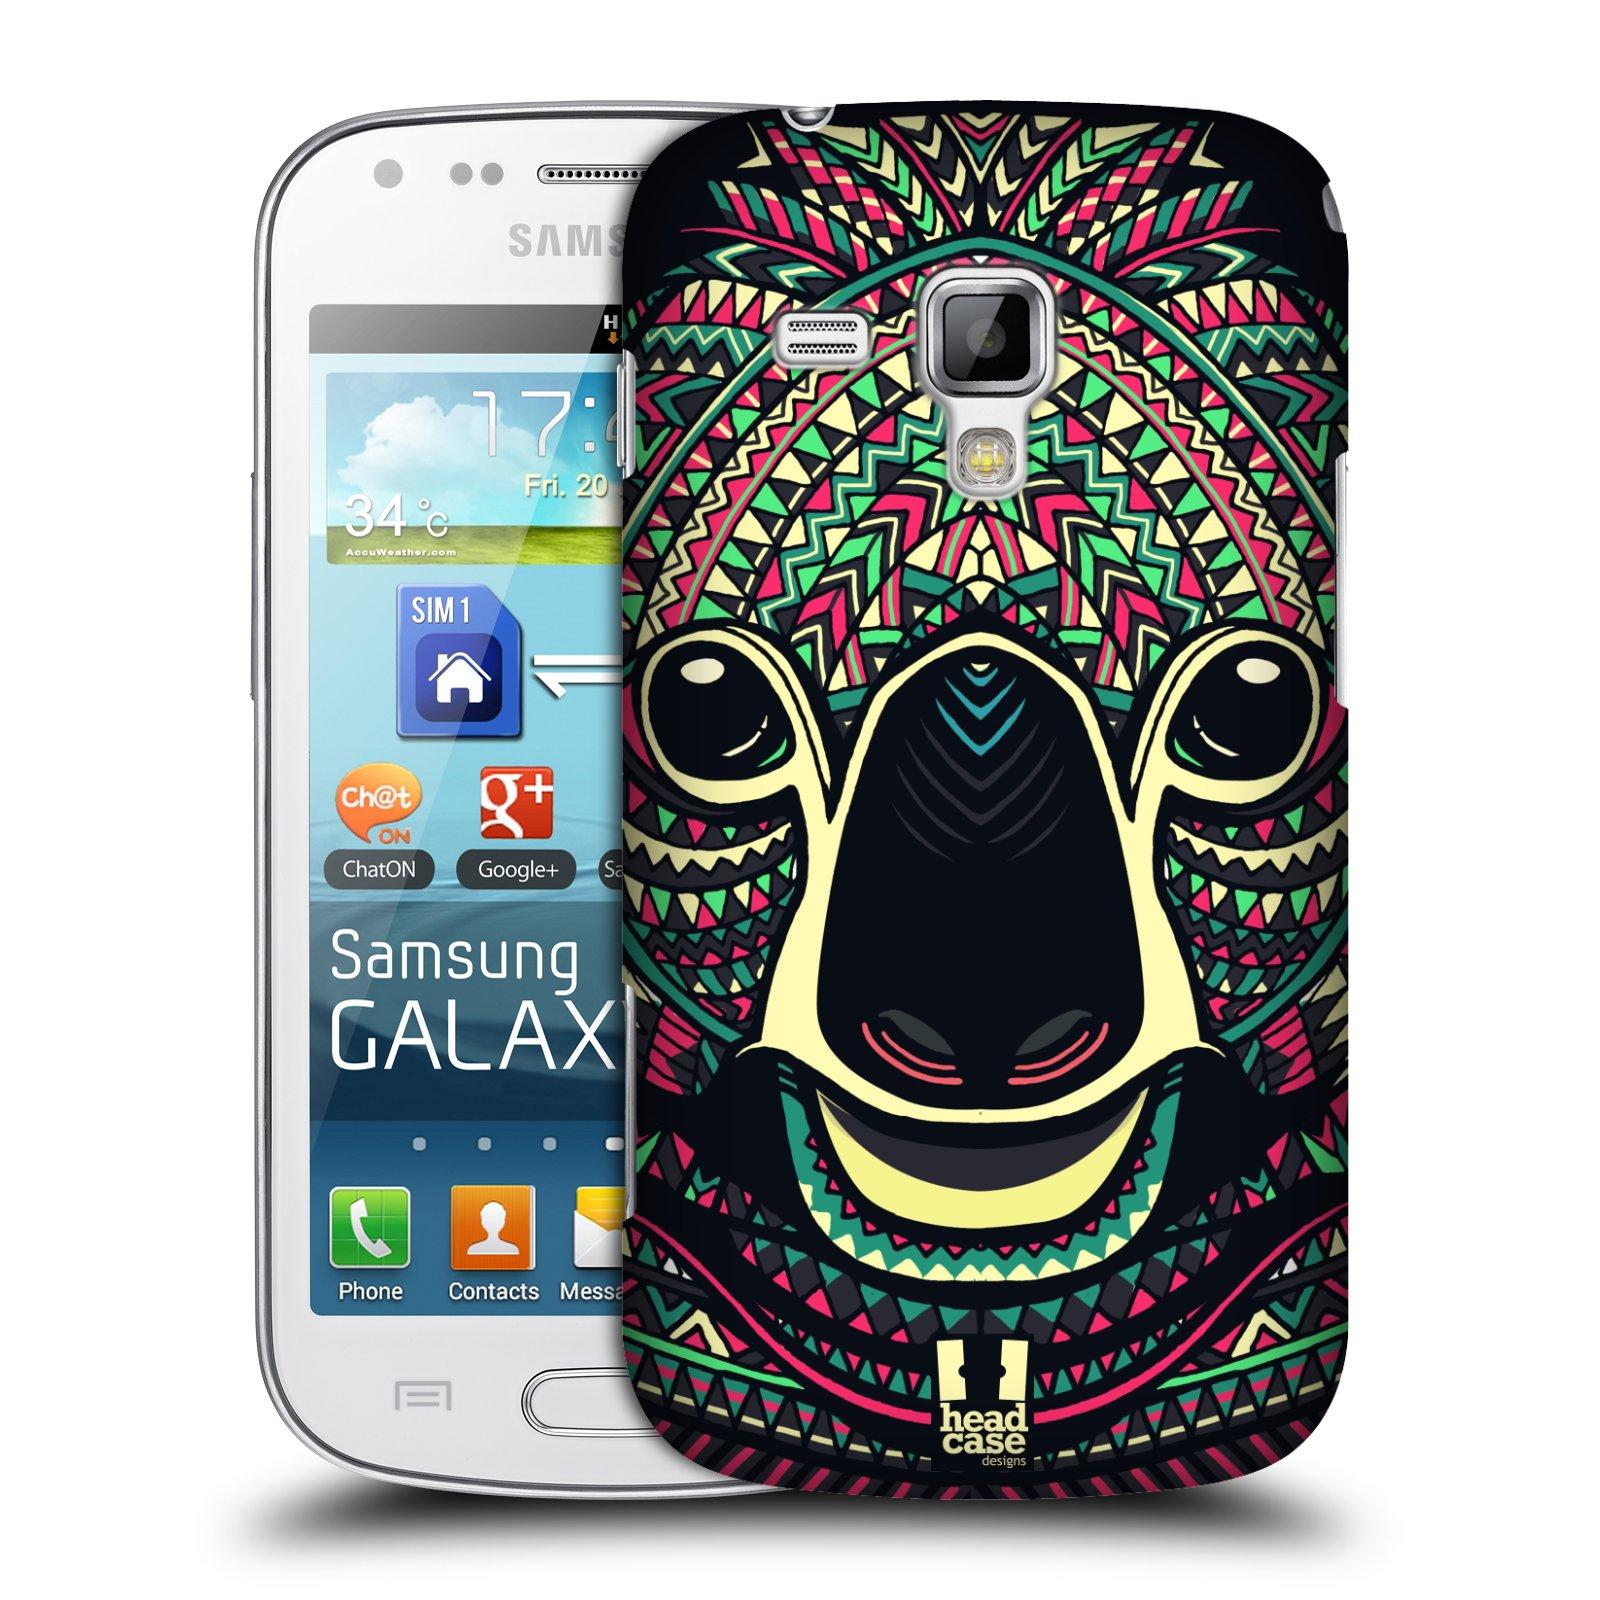 Plastové pouzdro na mobil Samsung Galaxy S Duos 2 HEAD CASE AZTEC KOALA (Kryt či obal na mobilní telefon Samsung Galaxy S Duos 2 GT-S7582)